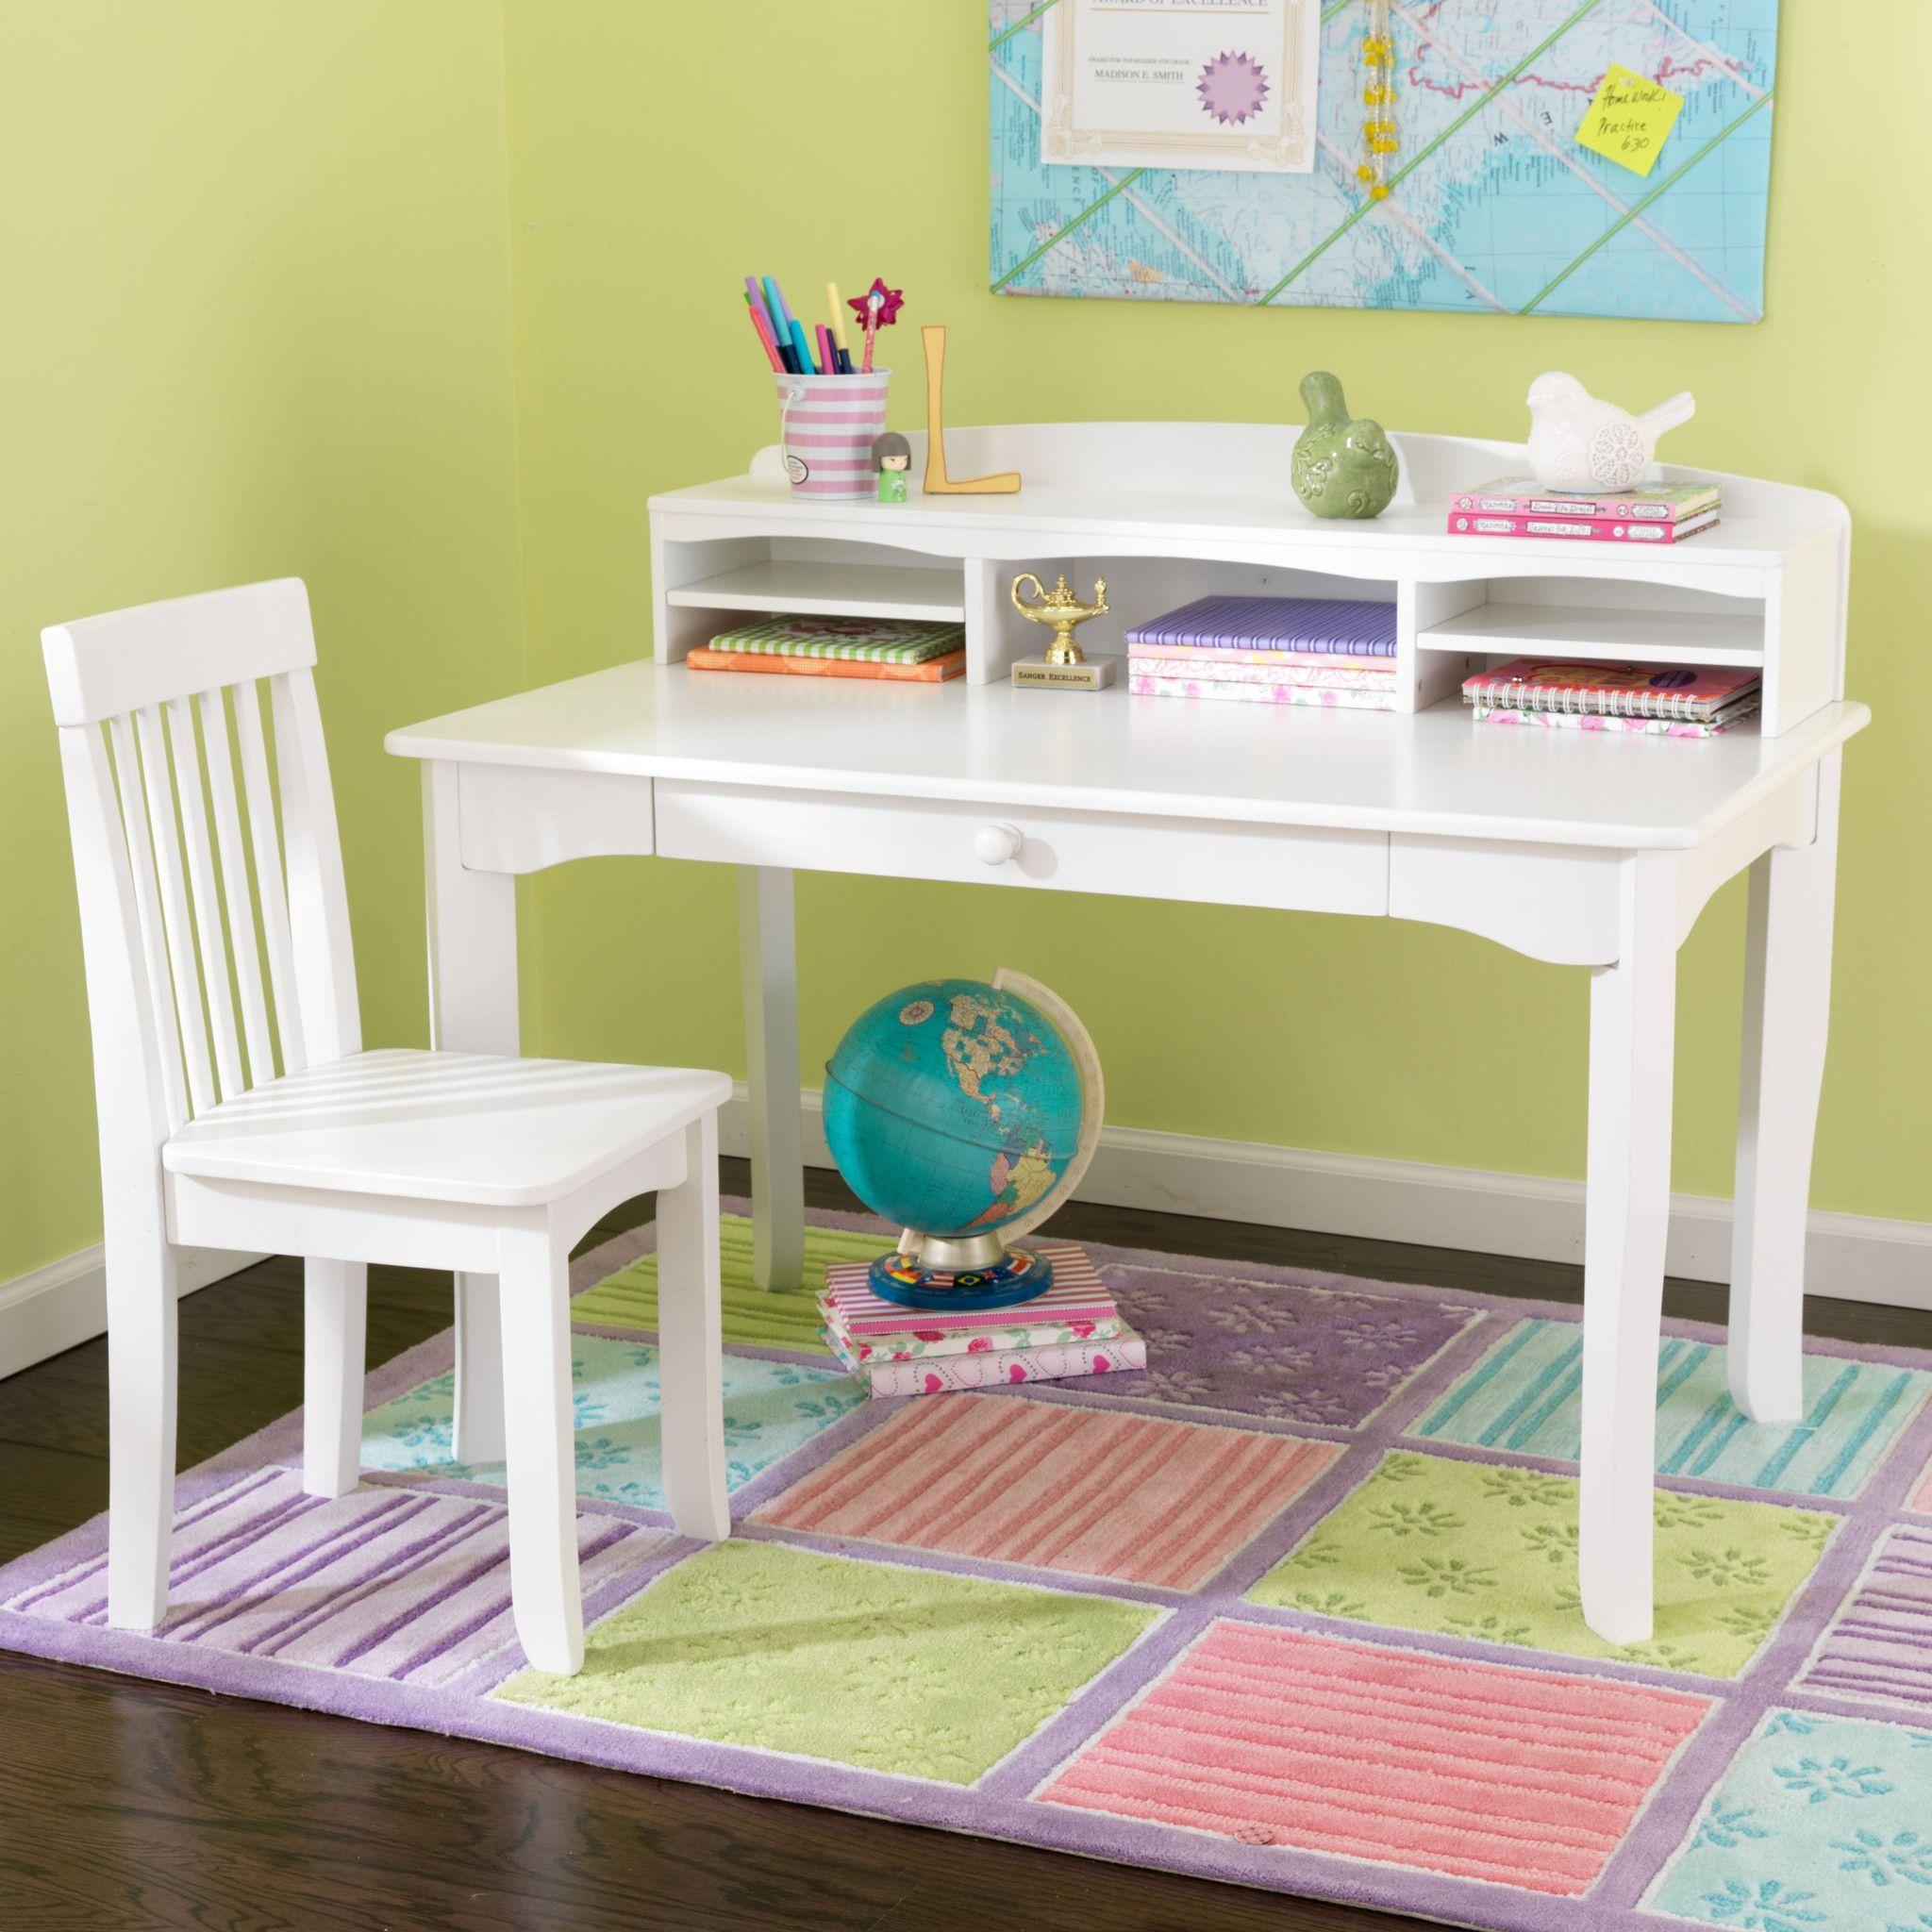 Kidkraft Avalon Desk With Hutch - White 26705 206 Kidkraft'